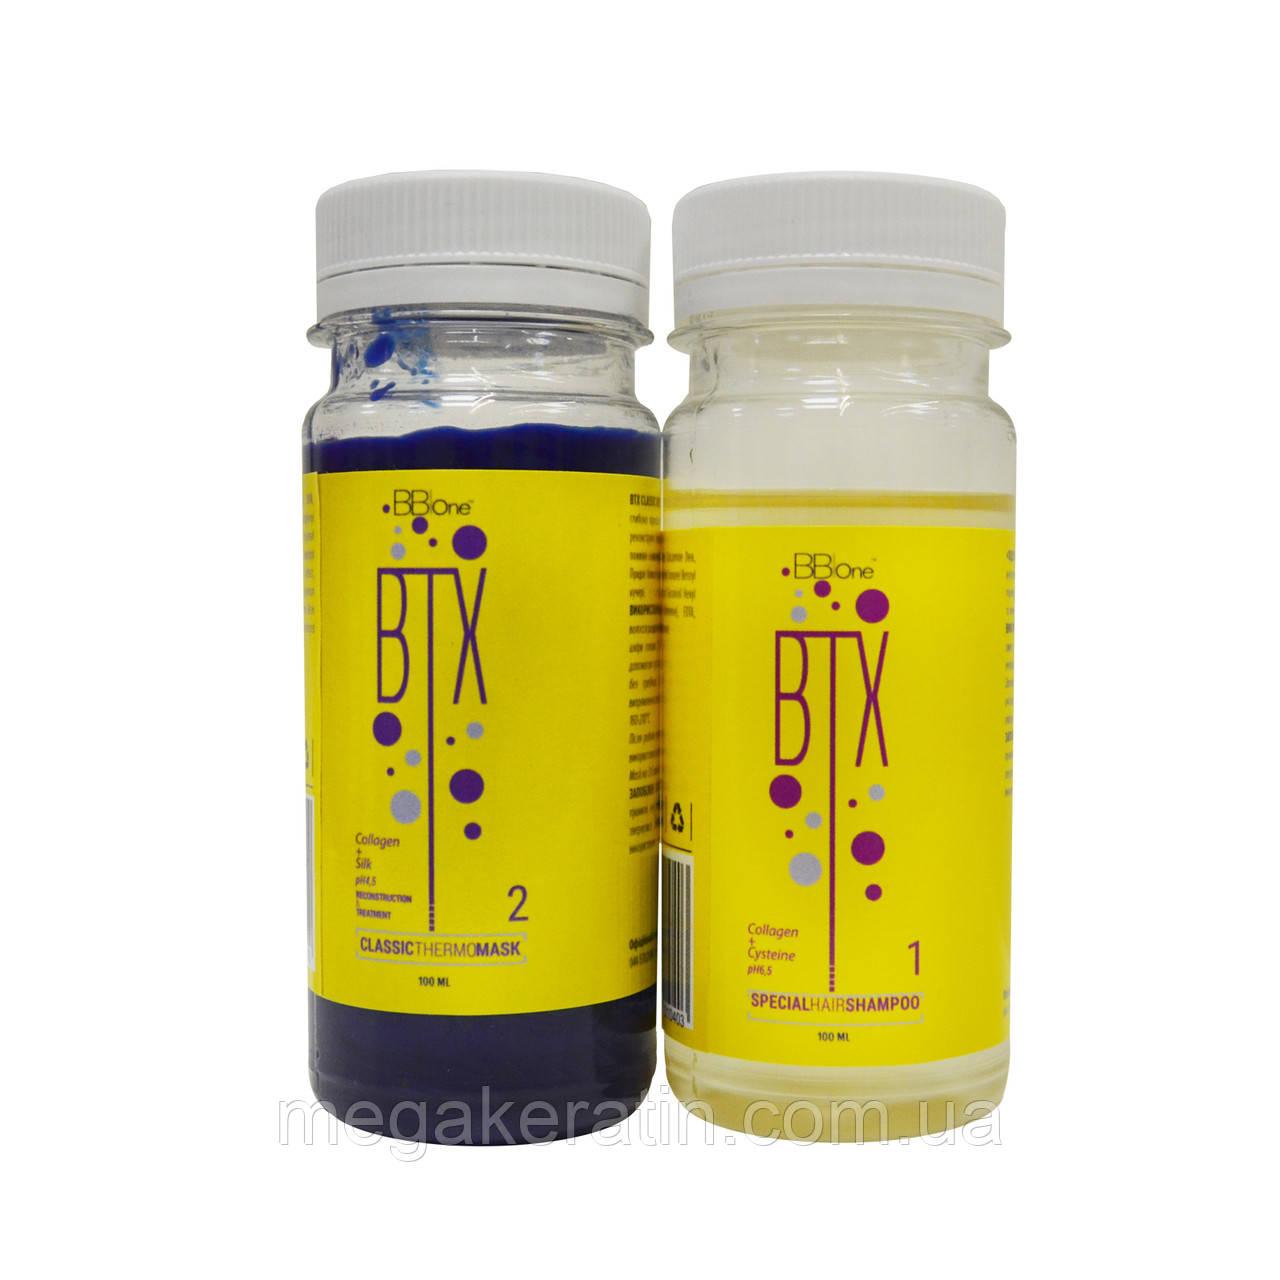 BB One. Набор BTX Classic (pH 4,5) / BTX Шампунь (шаг 1 + шаг 2) - 100 мл.